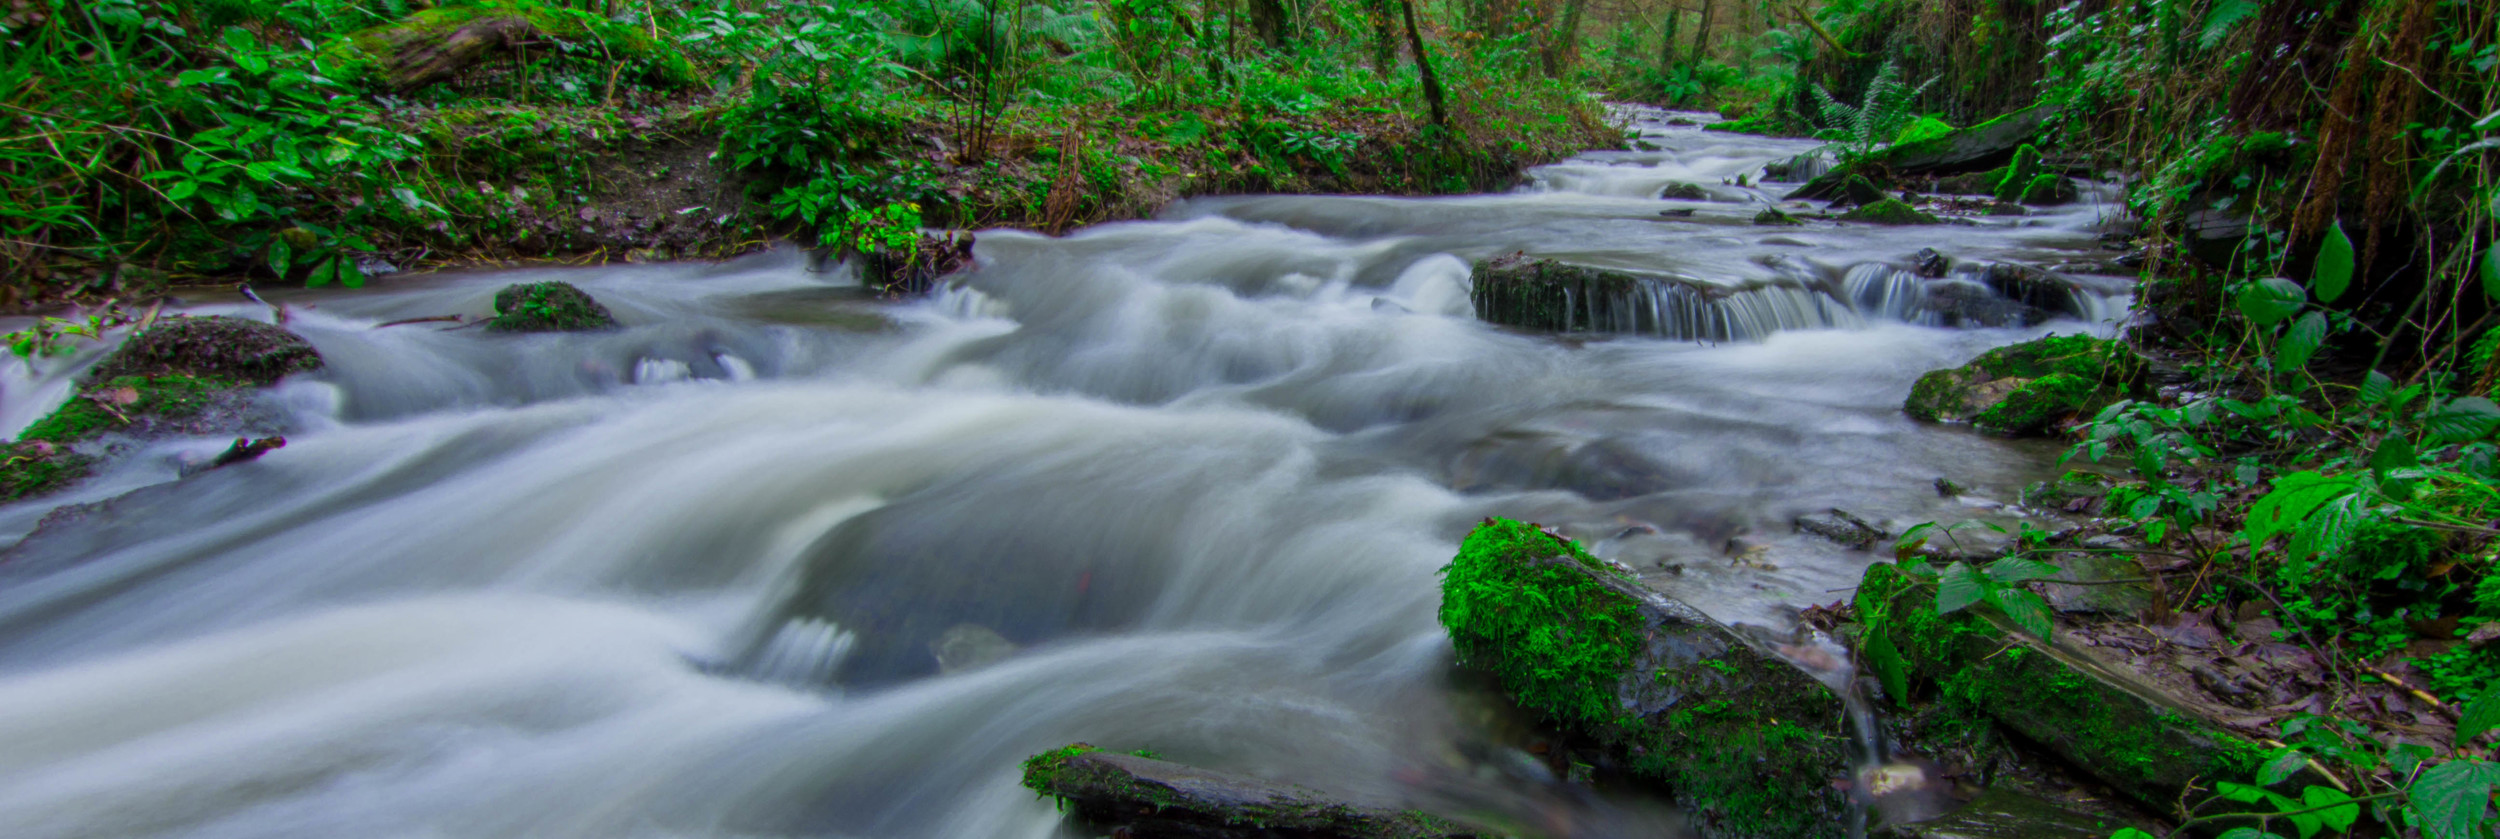 Cornwall Green Stream.jpg